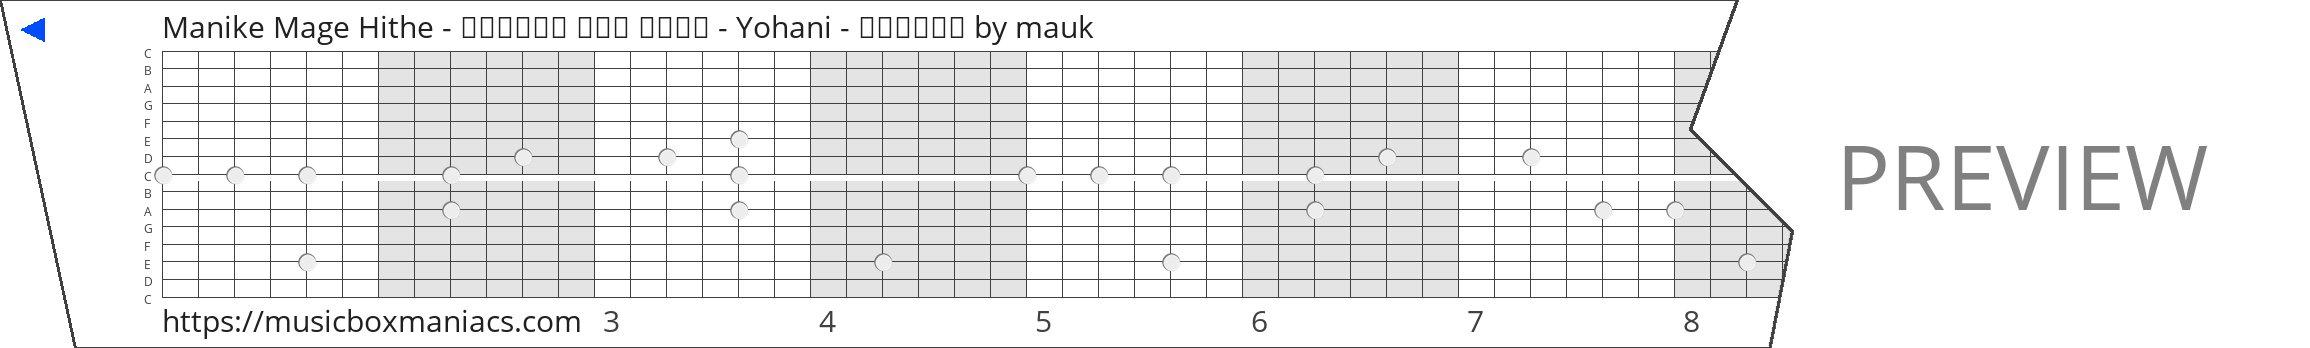 Manike Mage Hithe - මැණිකේ මගේ හිතේ - Yohani - යොහානි 15 note music box paper strip